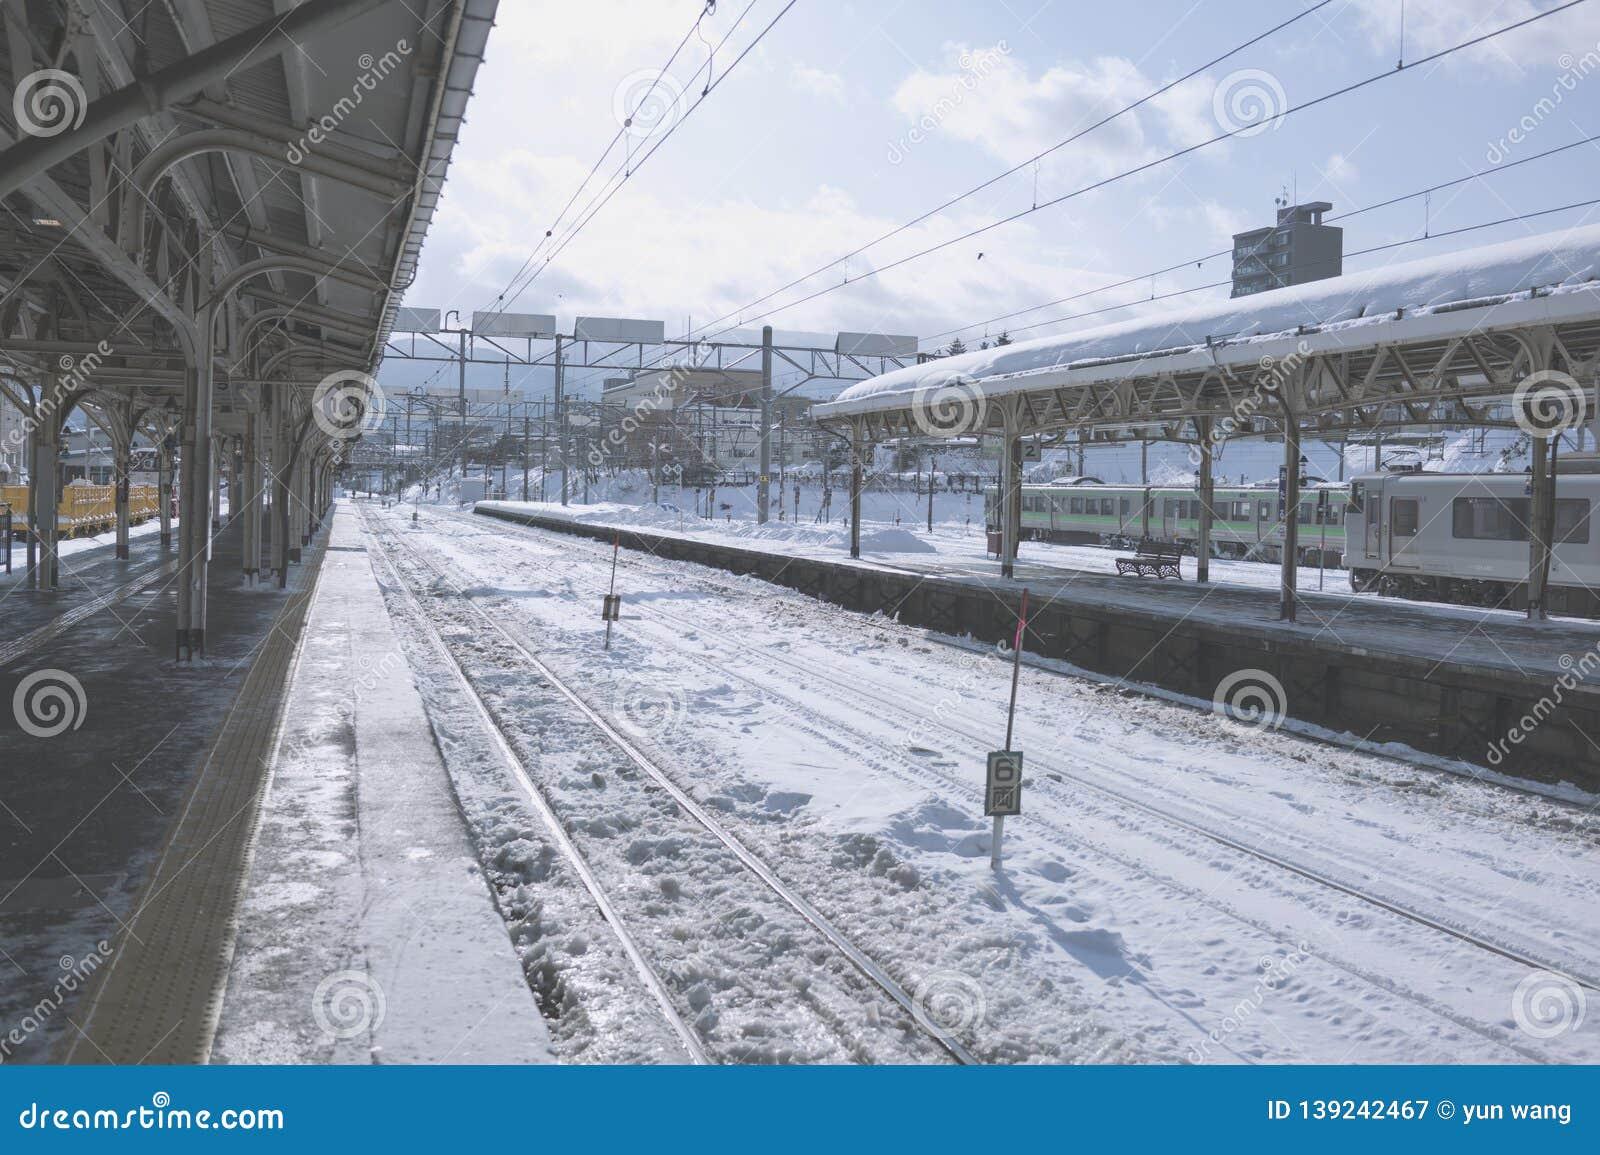 Hokkaido Railway